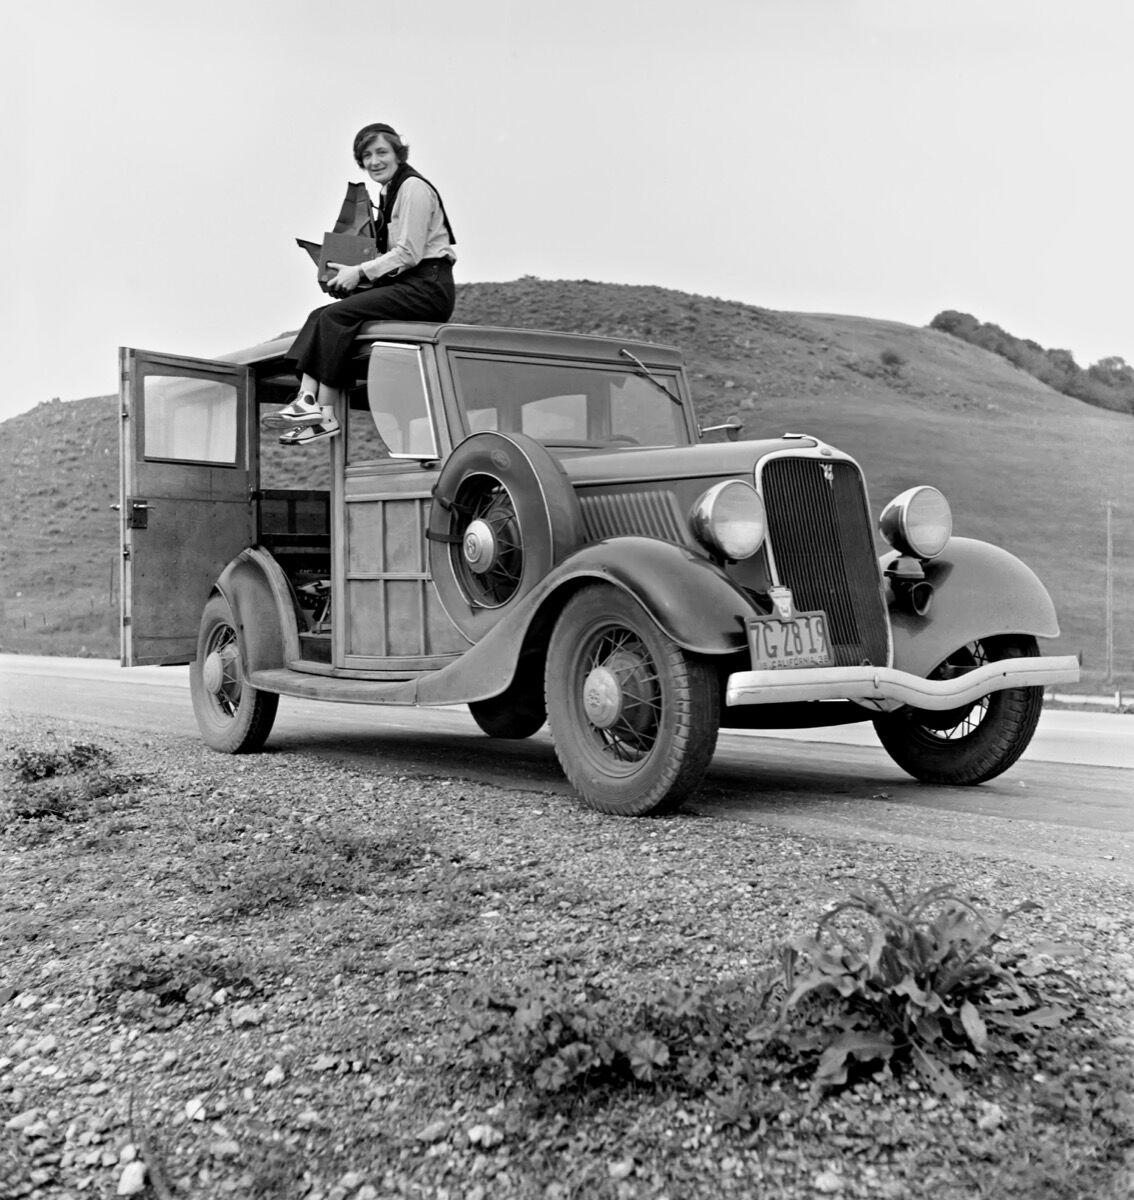 Photo of Dorothea Lange in California. Image via Wikimedia Commons.